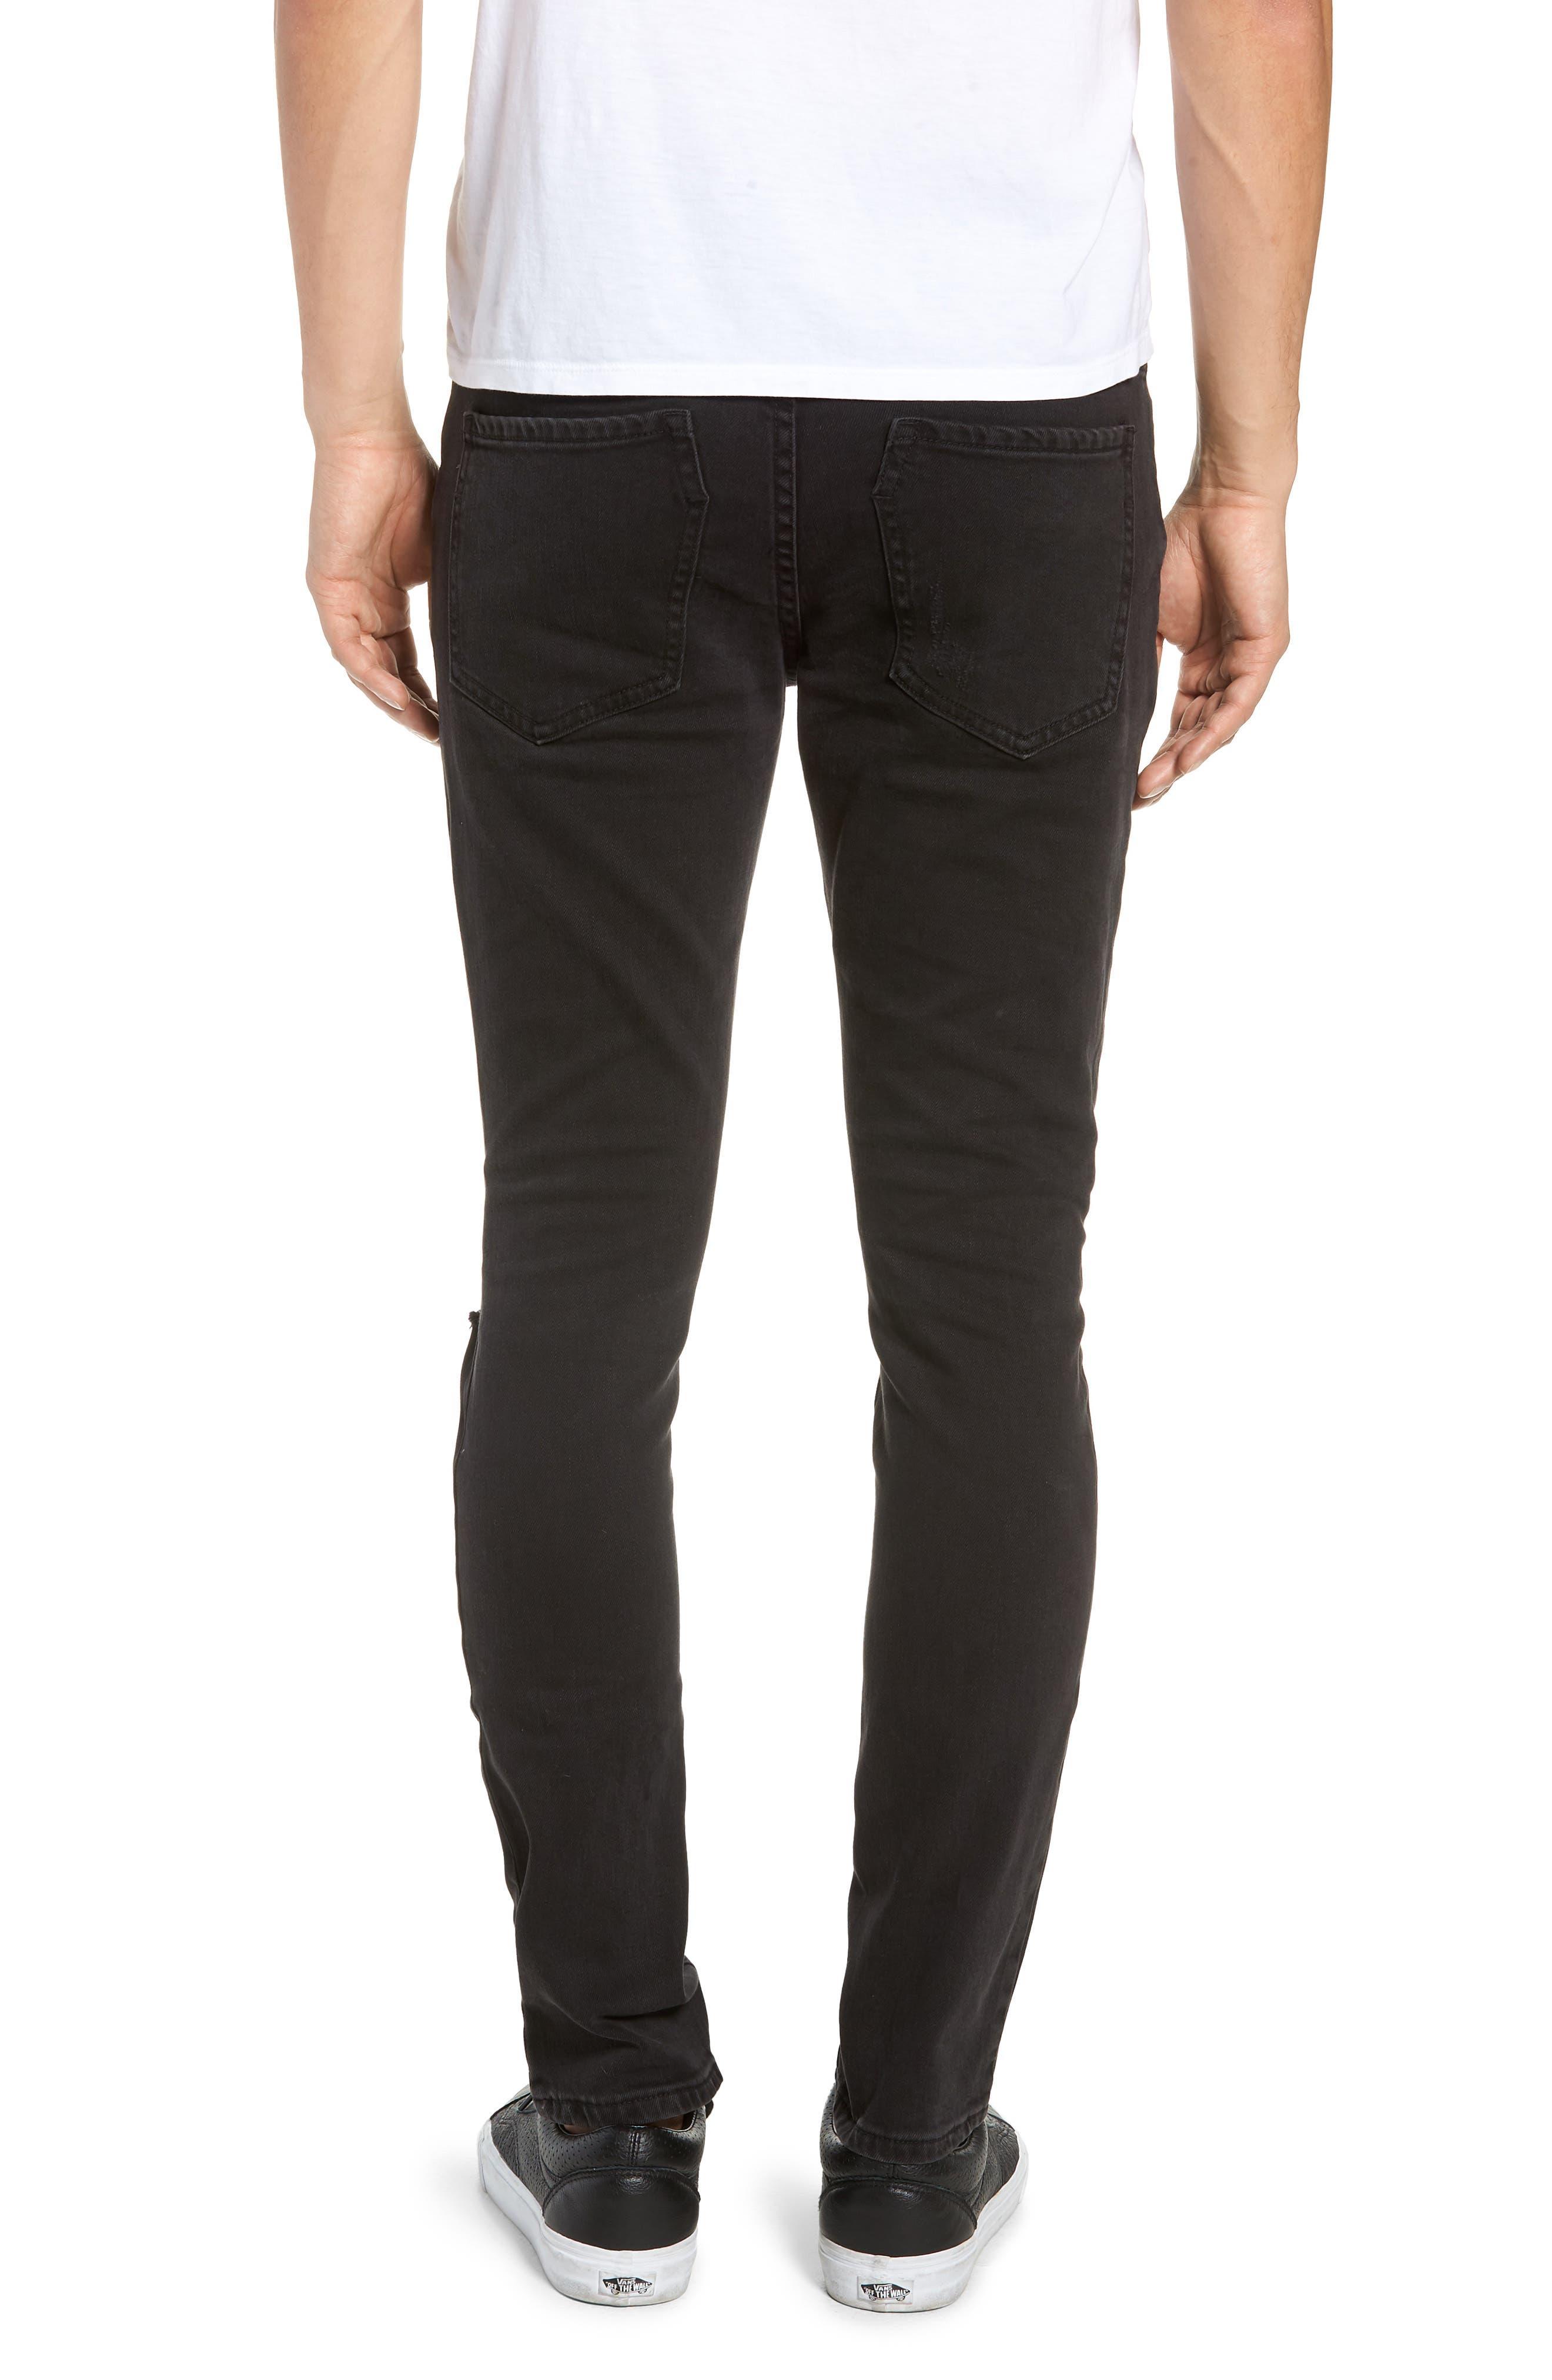 Joe Blow Slim Fit Jeans,                             Alternate thumbnail 2, color,                             BUSTED BLACK